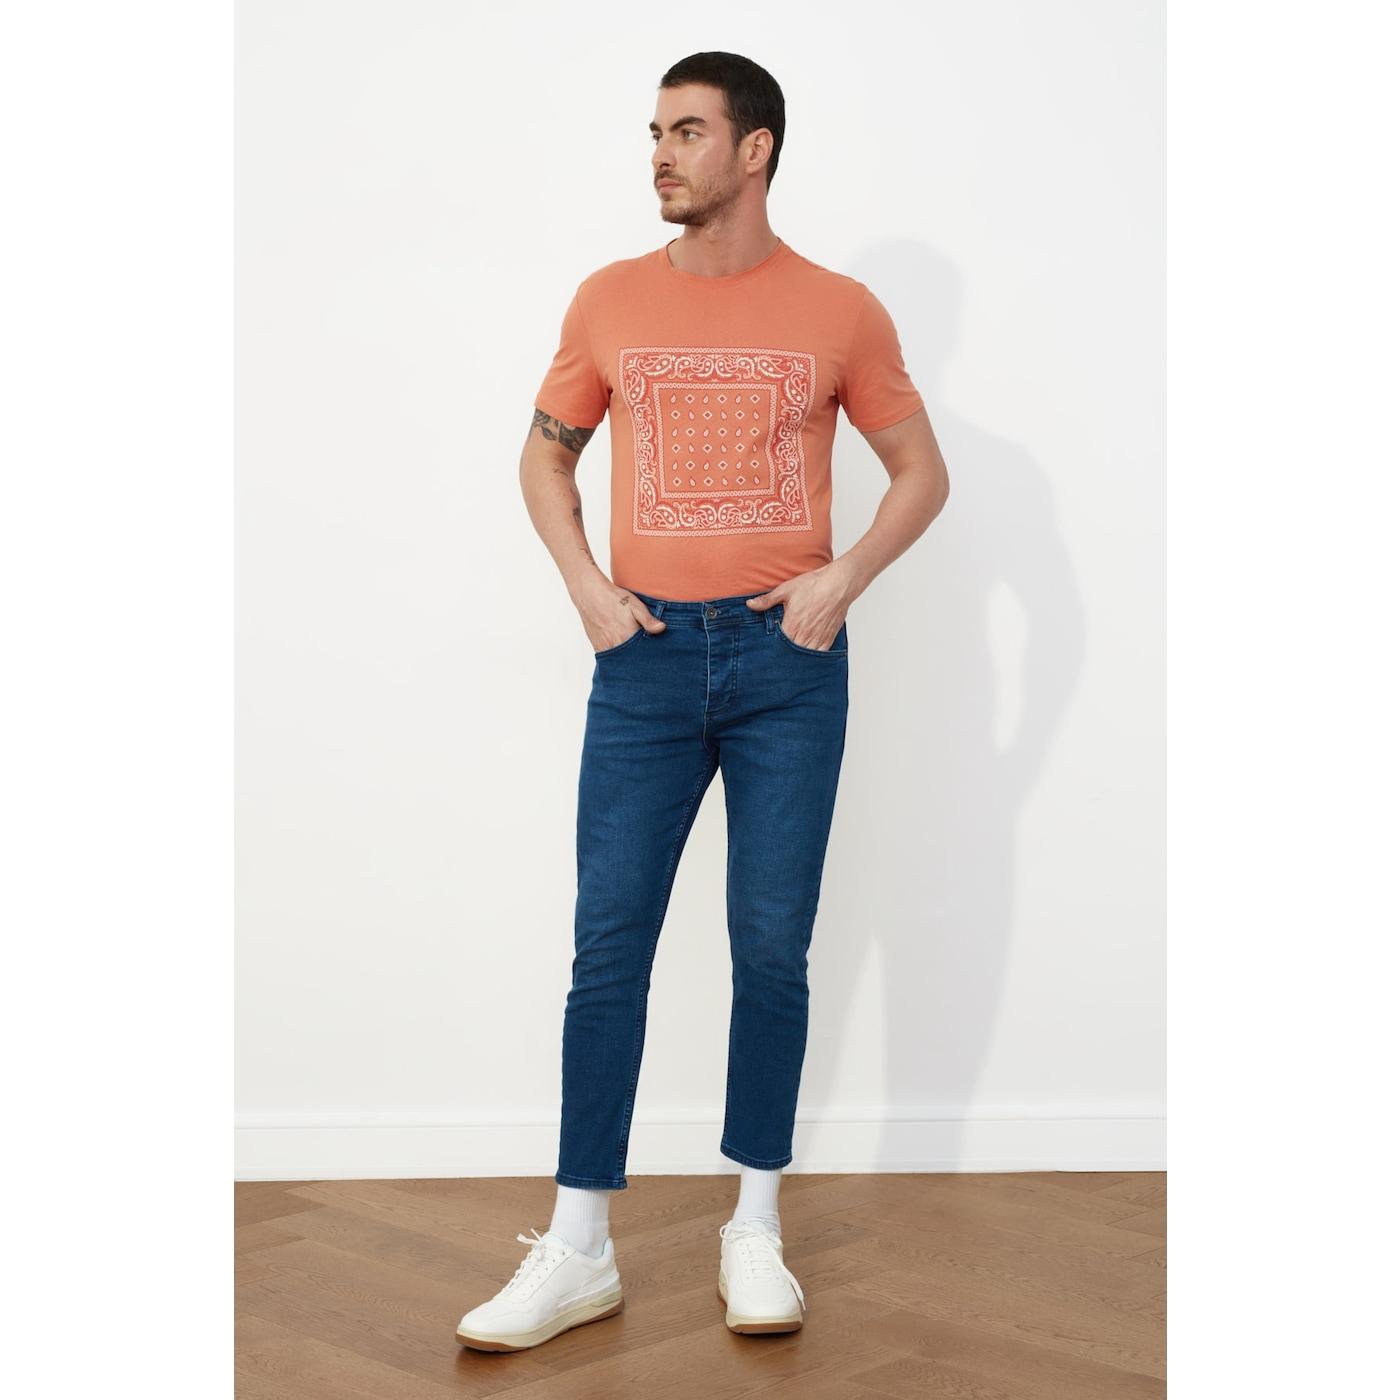 Trendyol Outdoor Navy Blue Male Skinny Crop Jeans AÇIK LACİVERT 29